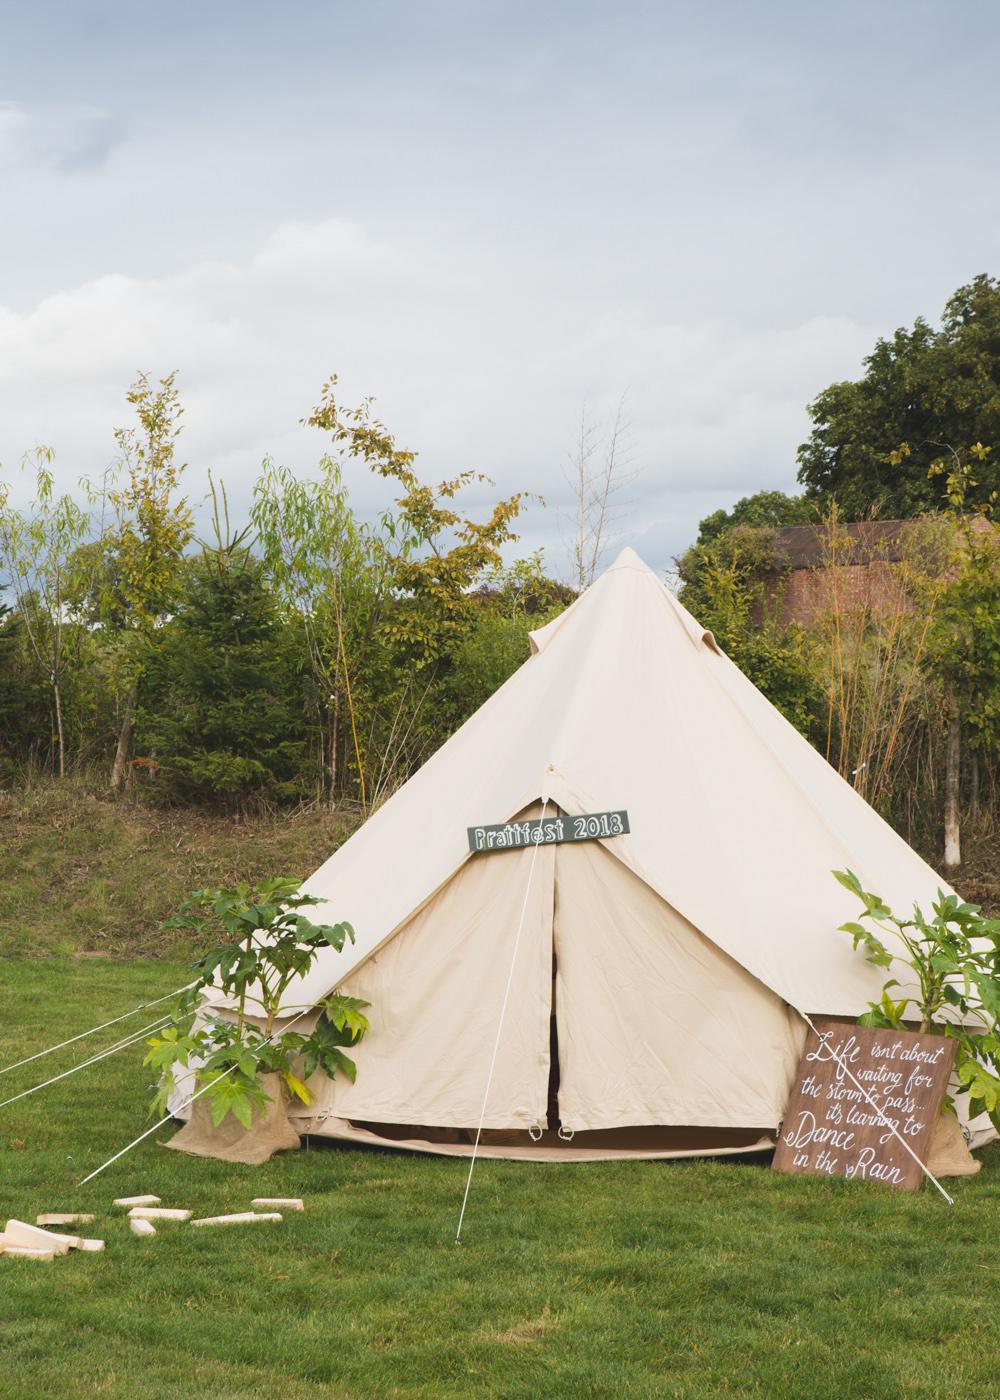 Glamping Tipi Tent Bell Airbnb Wedding Pickavance Weddings